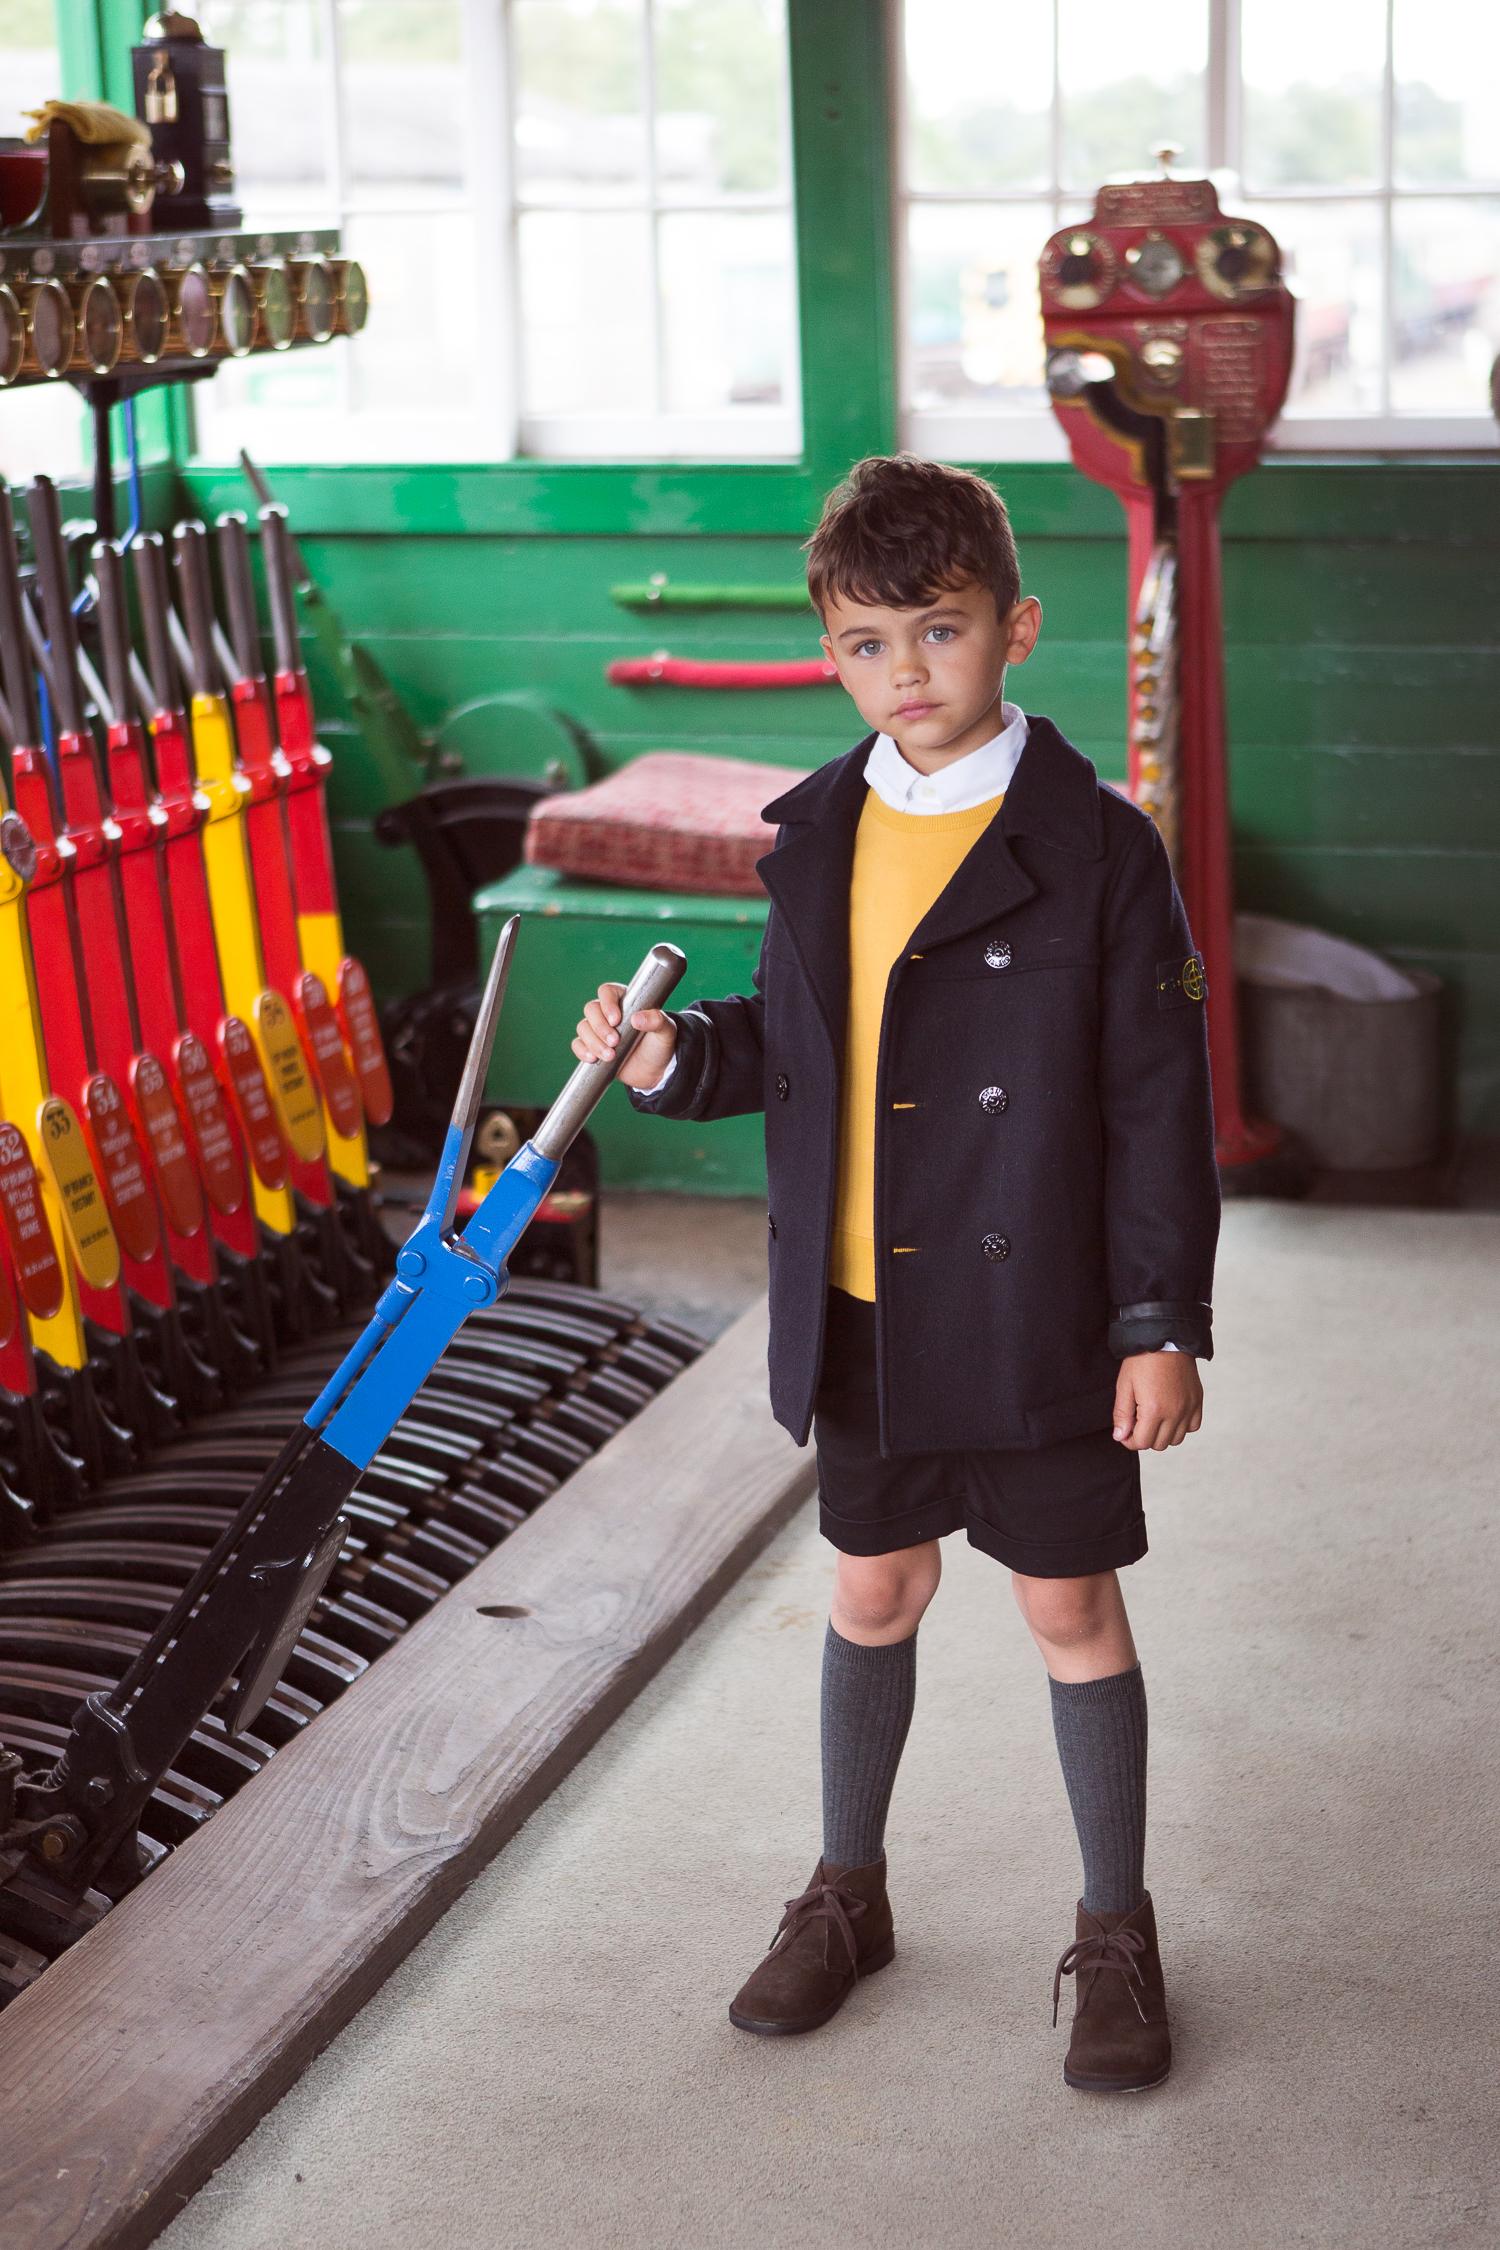 childrens portrait photographer--5.jpg